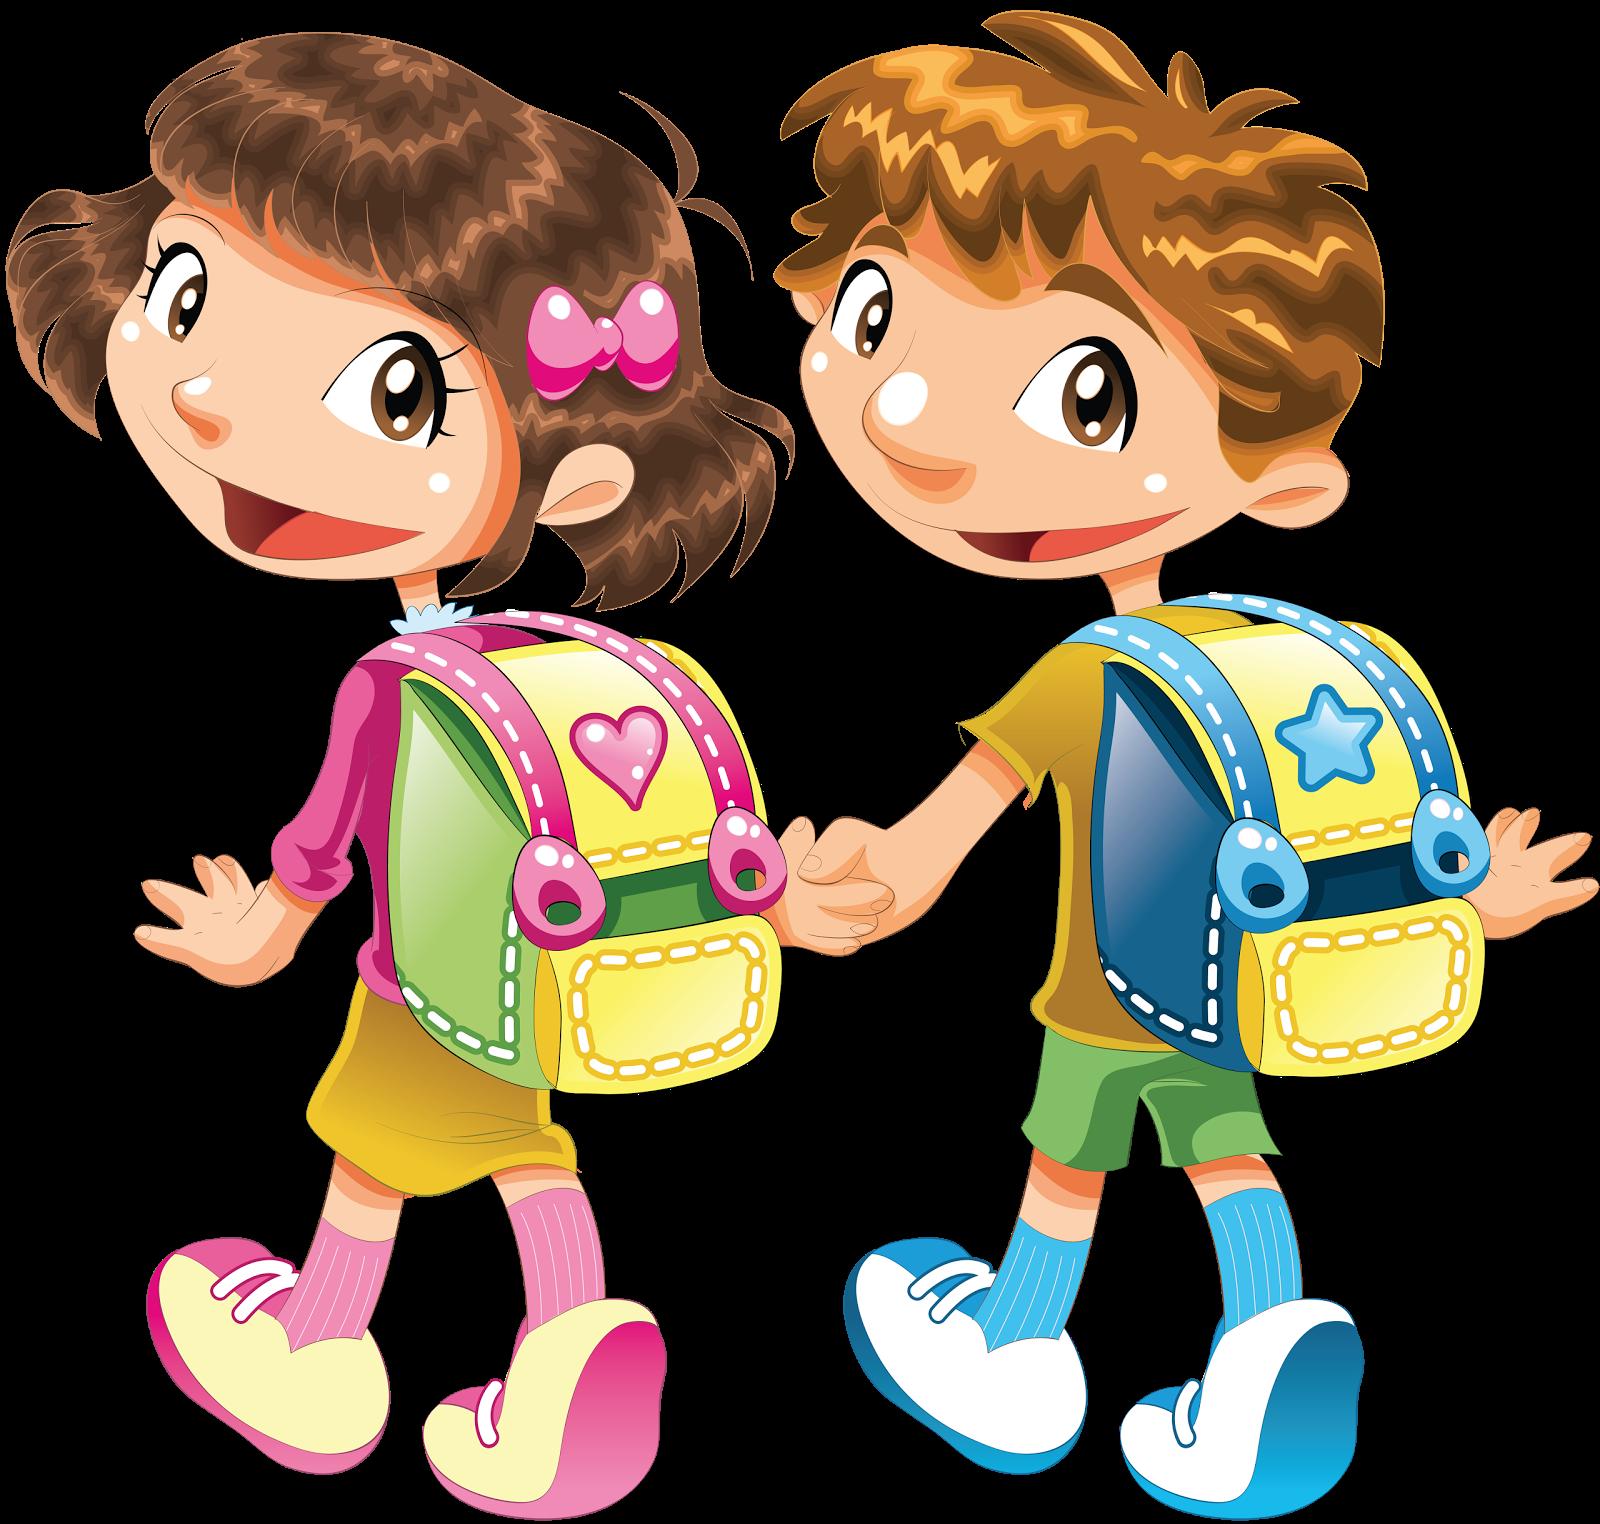 School activities clipart clip download dibujos niños png - Buscar con Google | Дети | Pinterest | School ... clip download